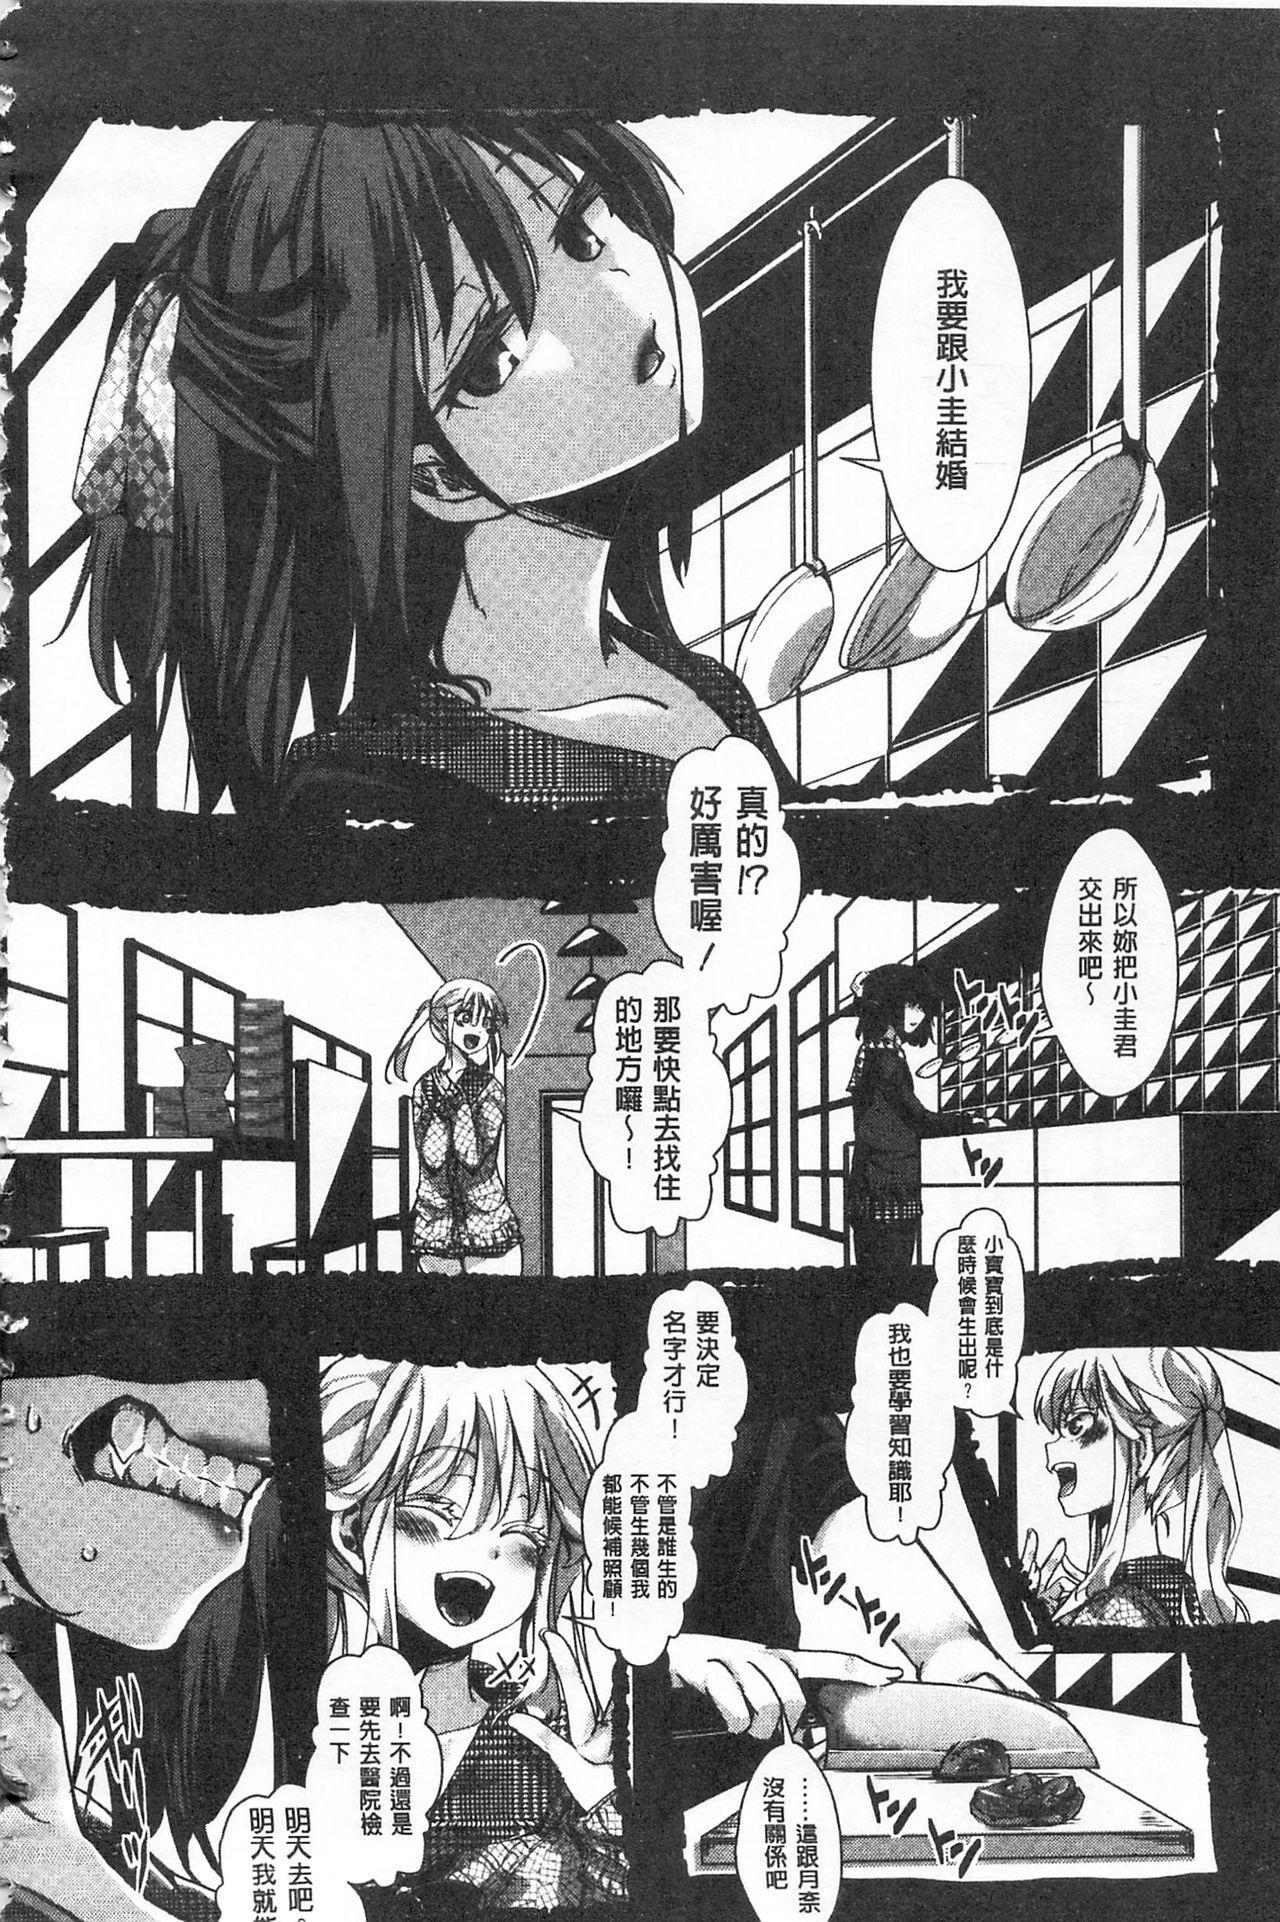 [hal] Daienjou -Ikare Ikasare Iki Ikare-   ∞艶嬢 -洩出來被搞到洩掛了被搞掛-  [Chinese] 189